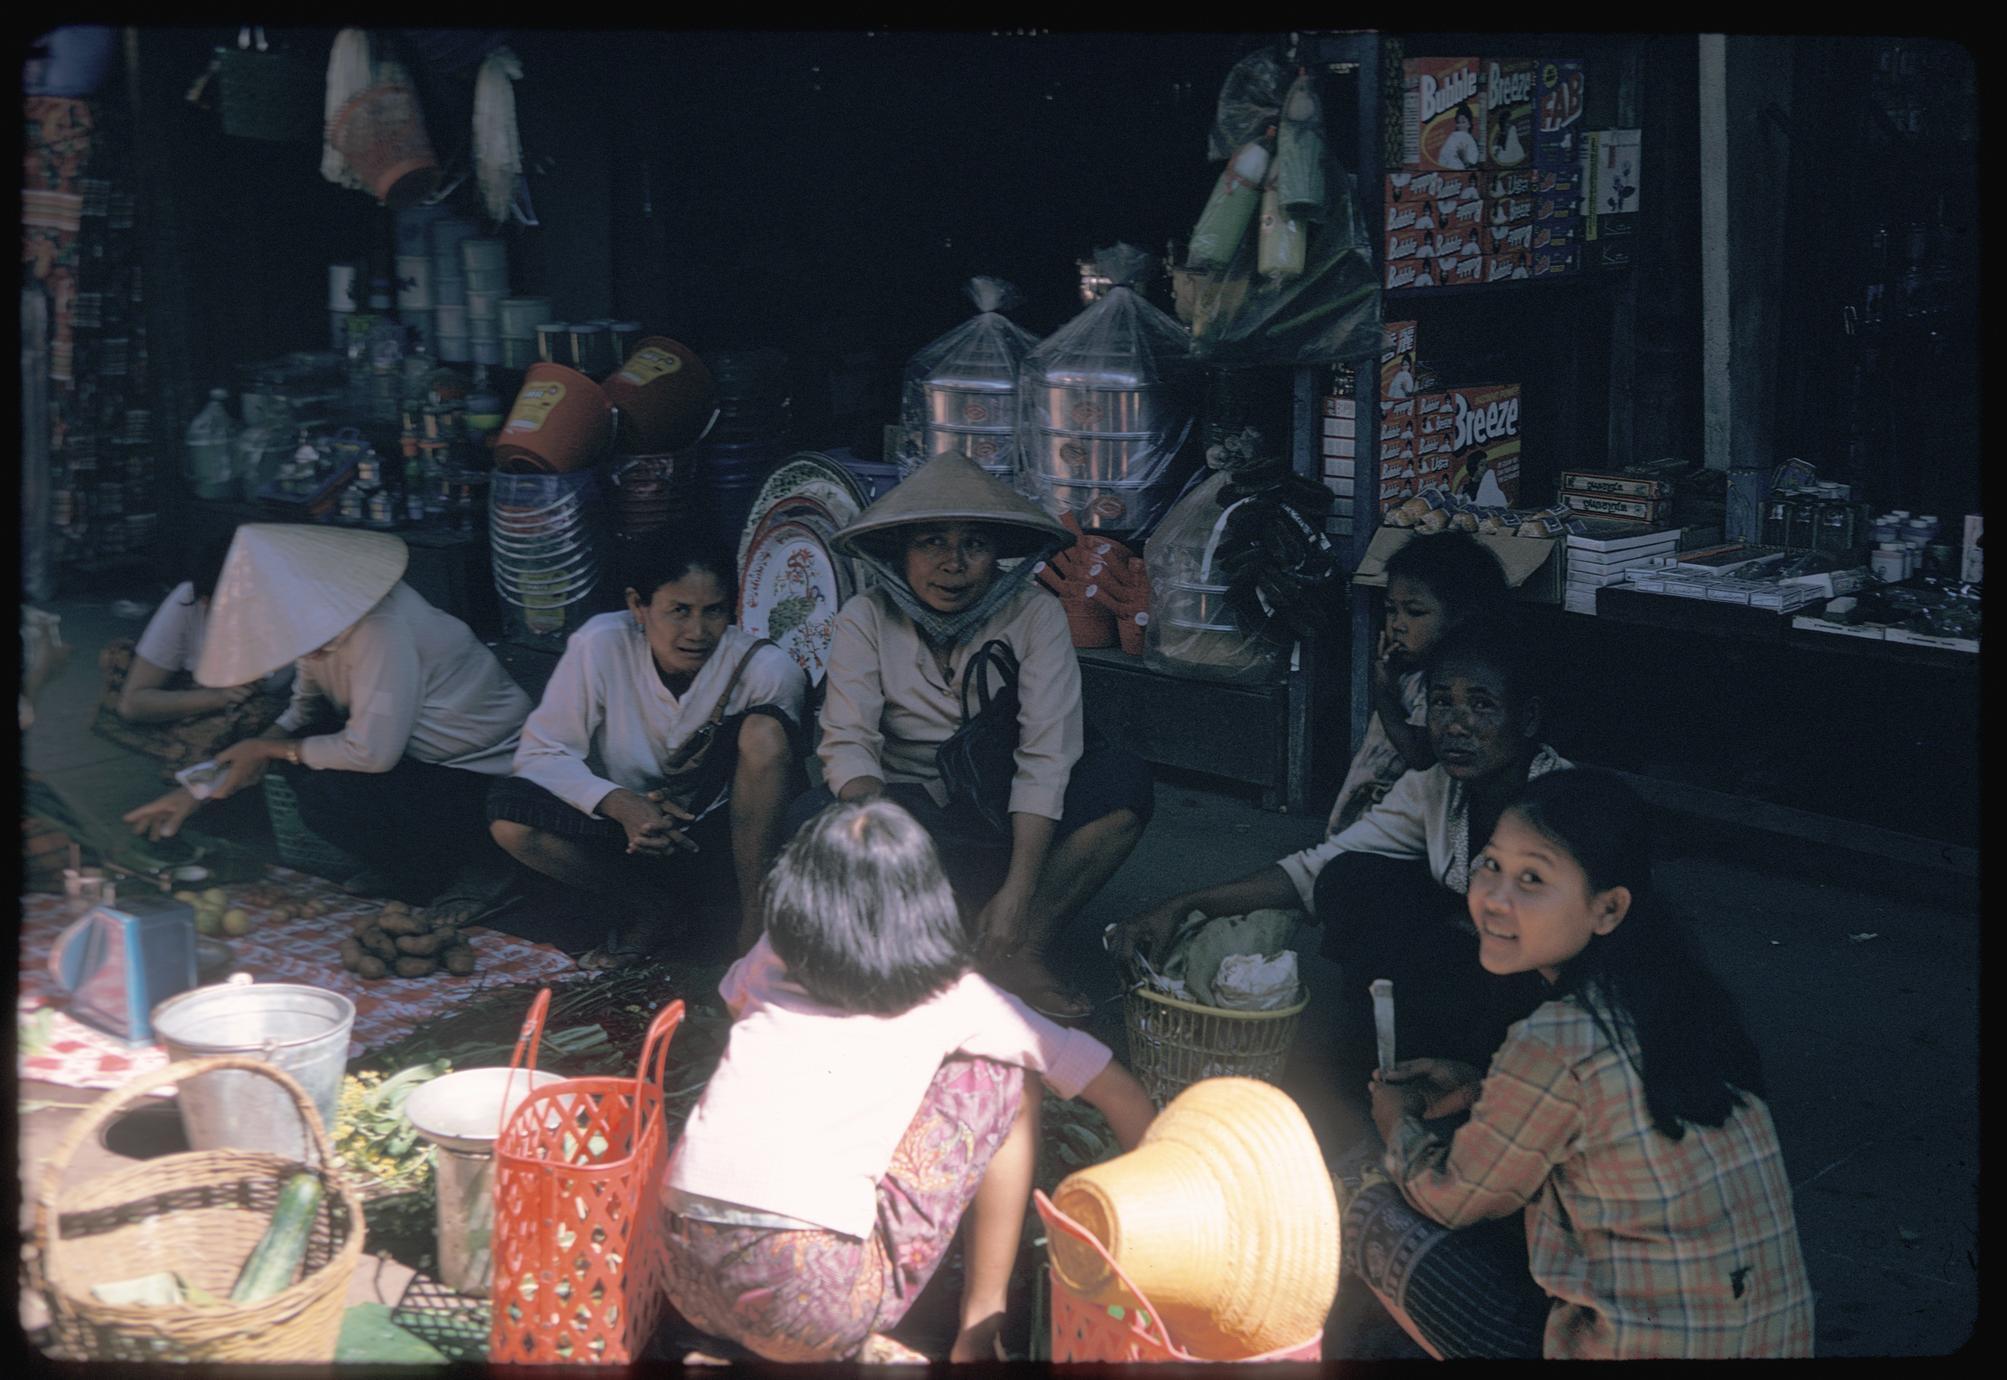 Morning Market : Vietnamese women